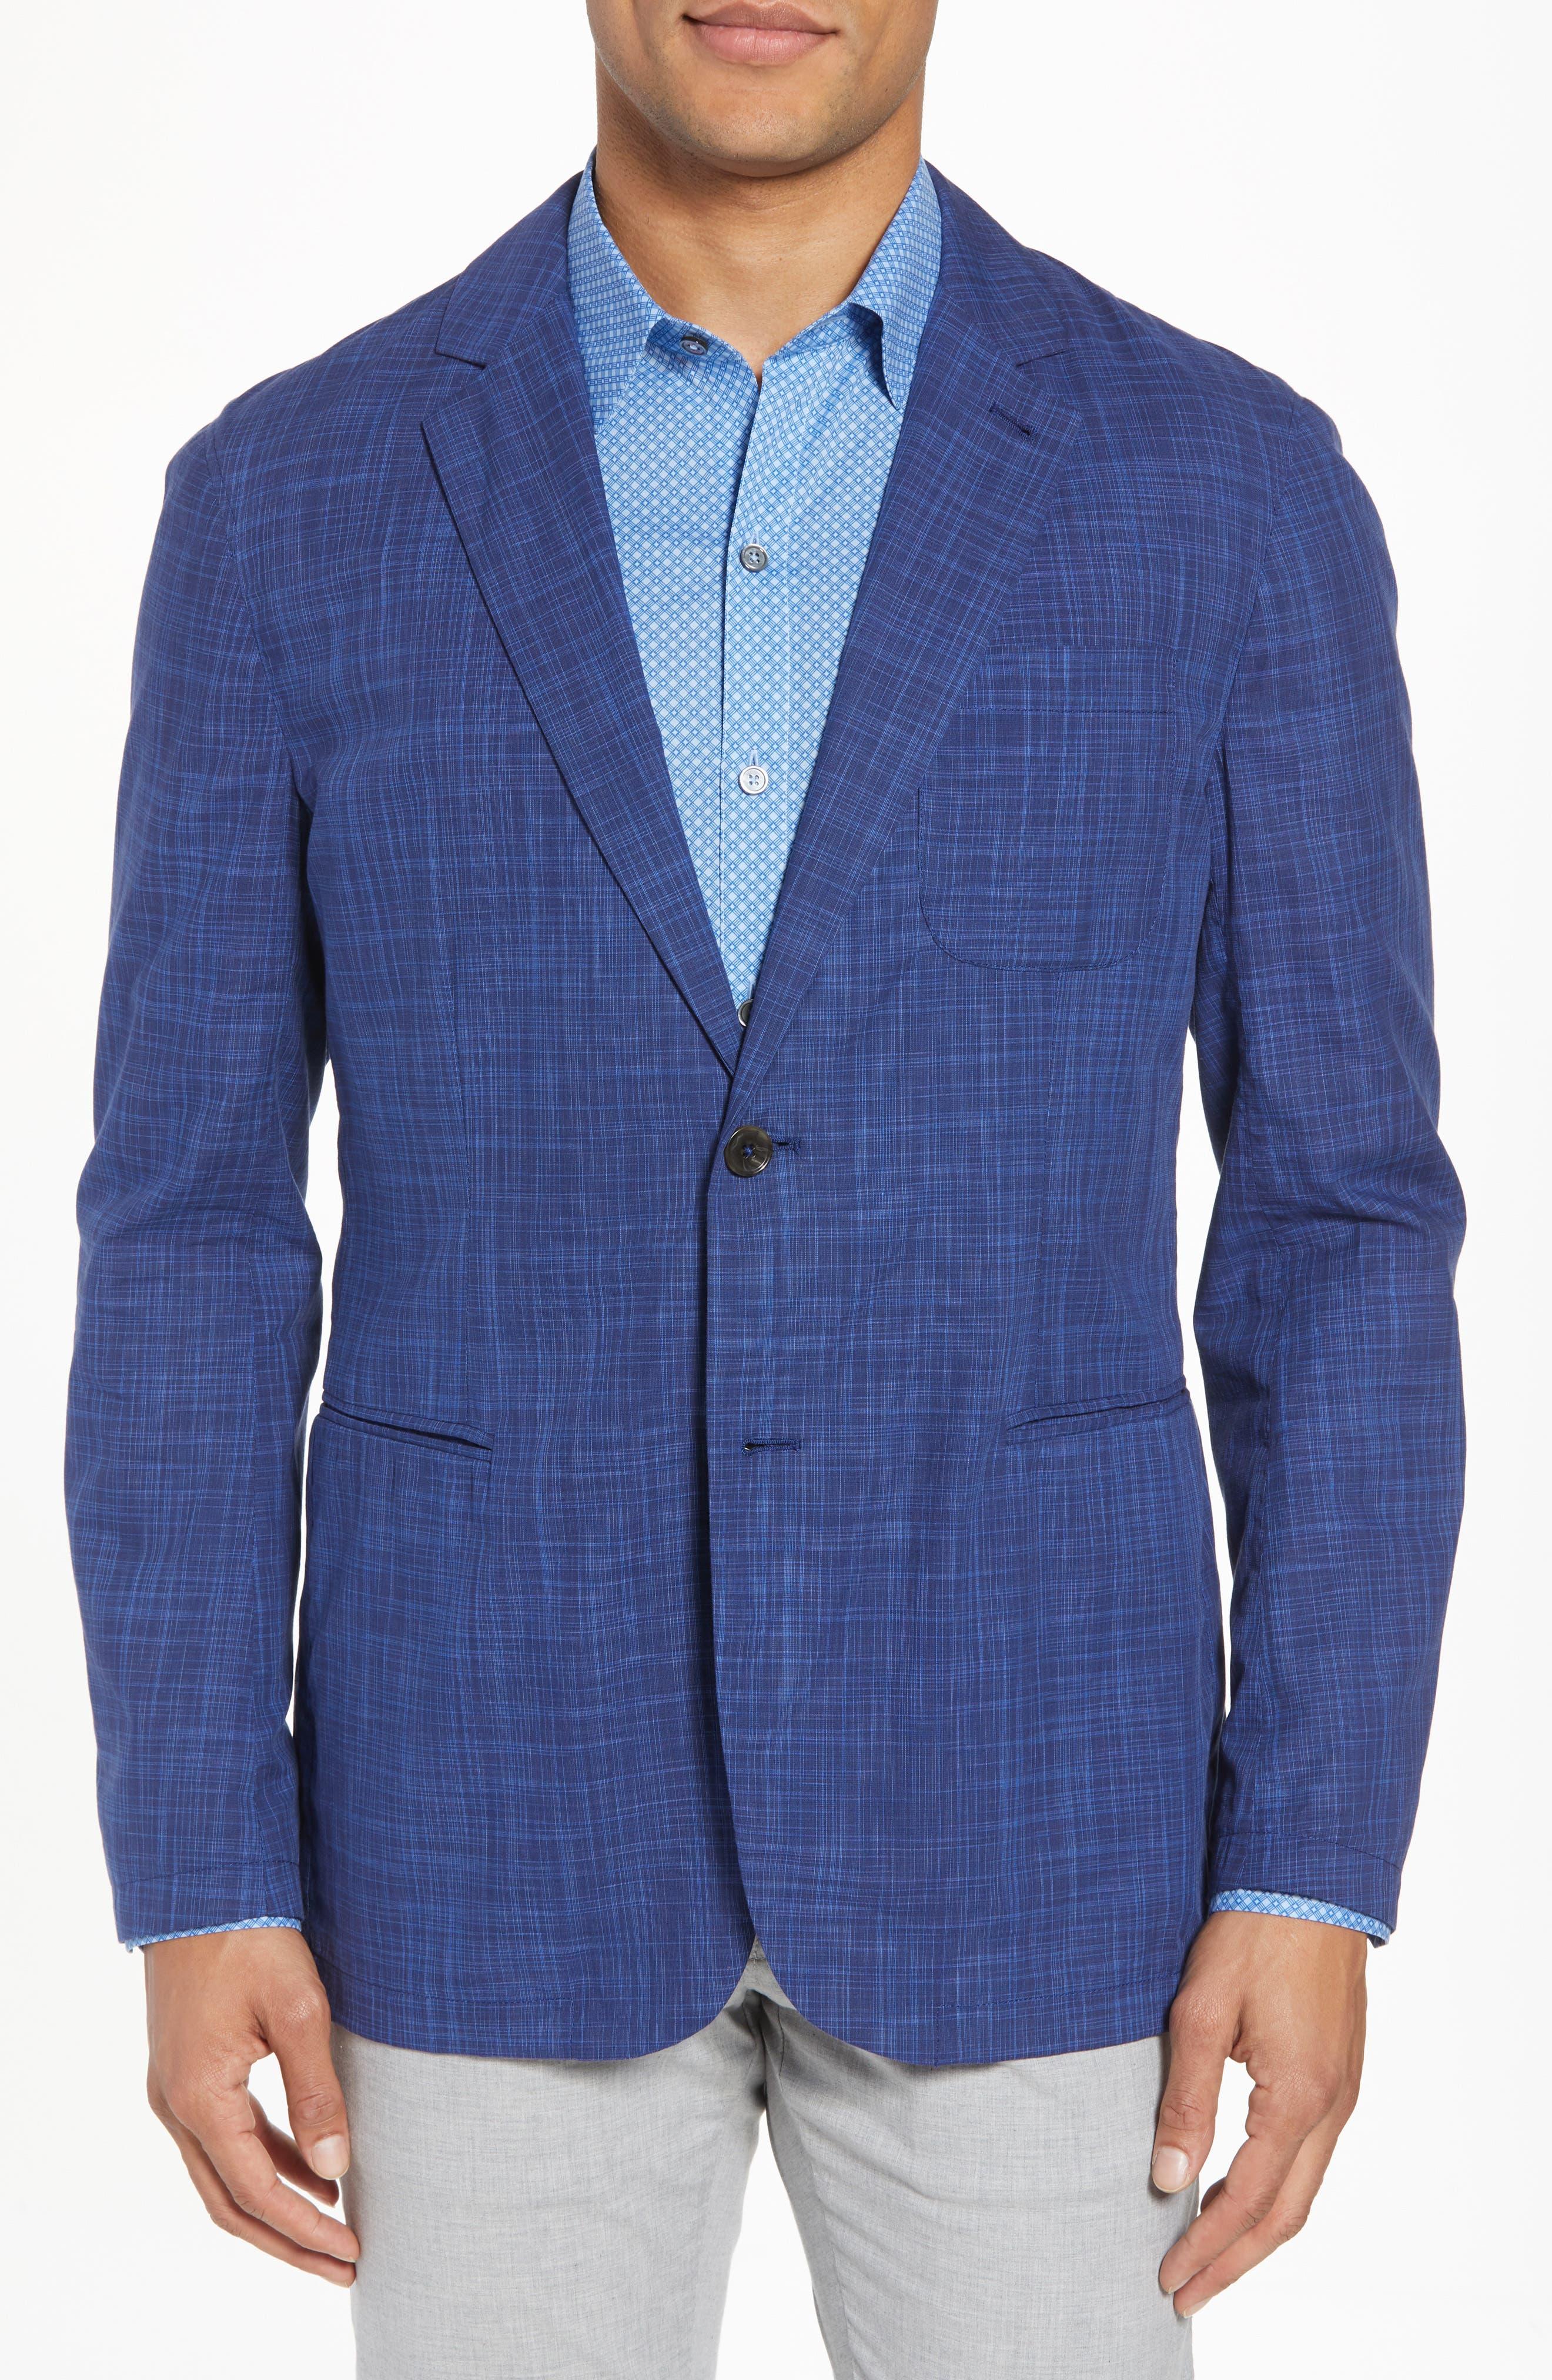 Belmont Regular Fit Sport Coat,                         Main,                         color, Blue